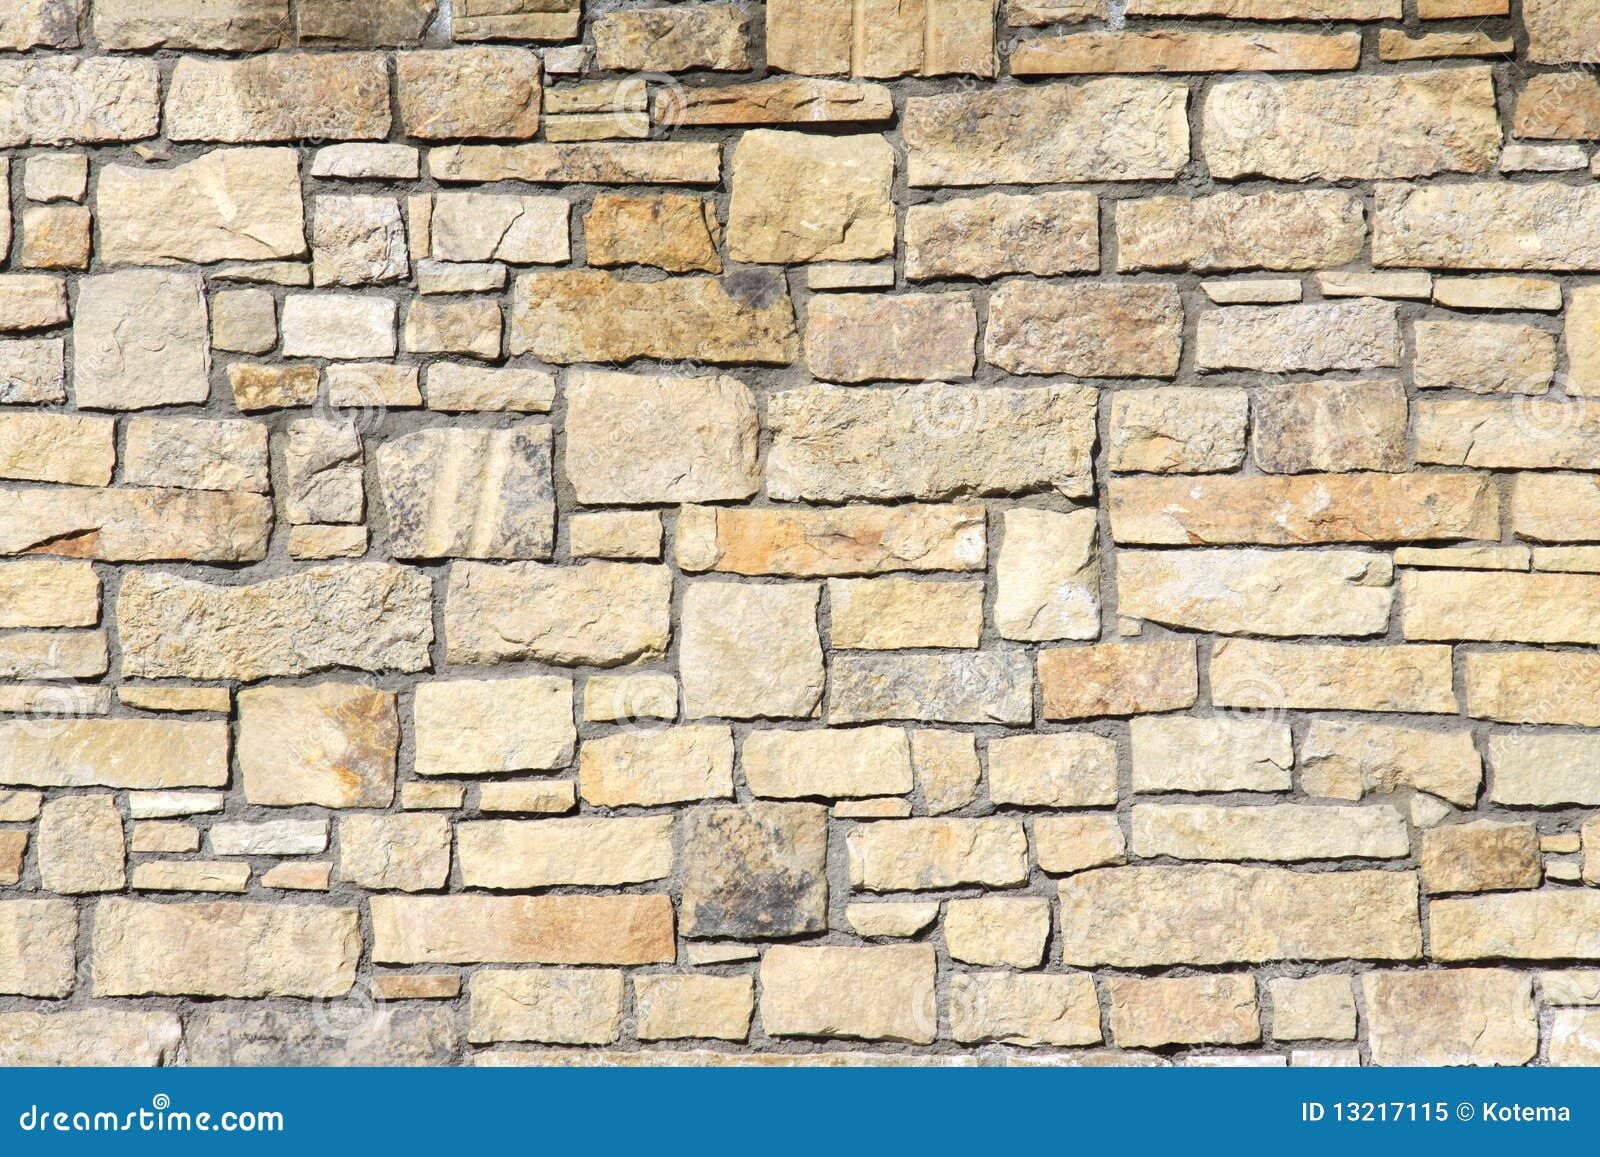 Stone Block Wall Terraria : Stone wall royalty free stock photo image